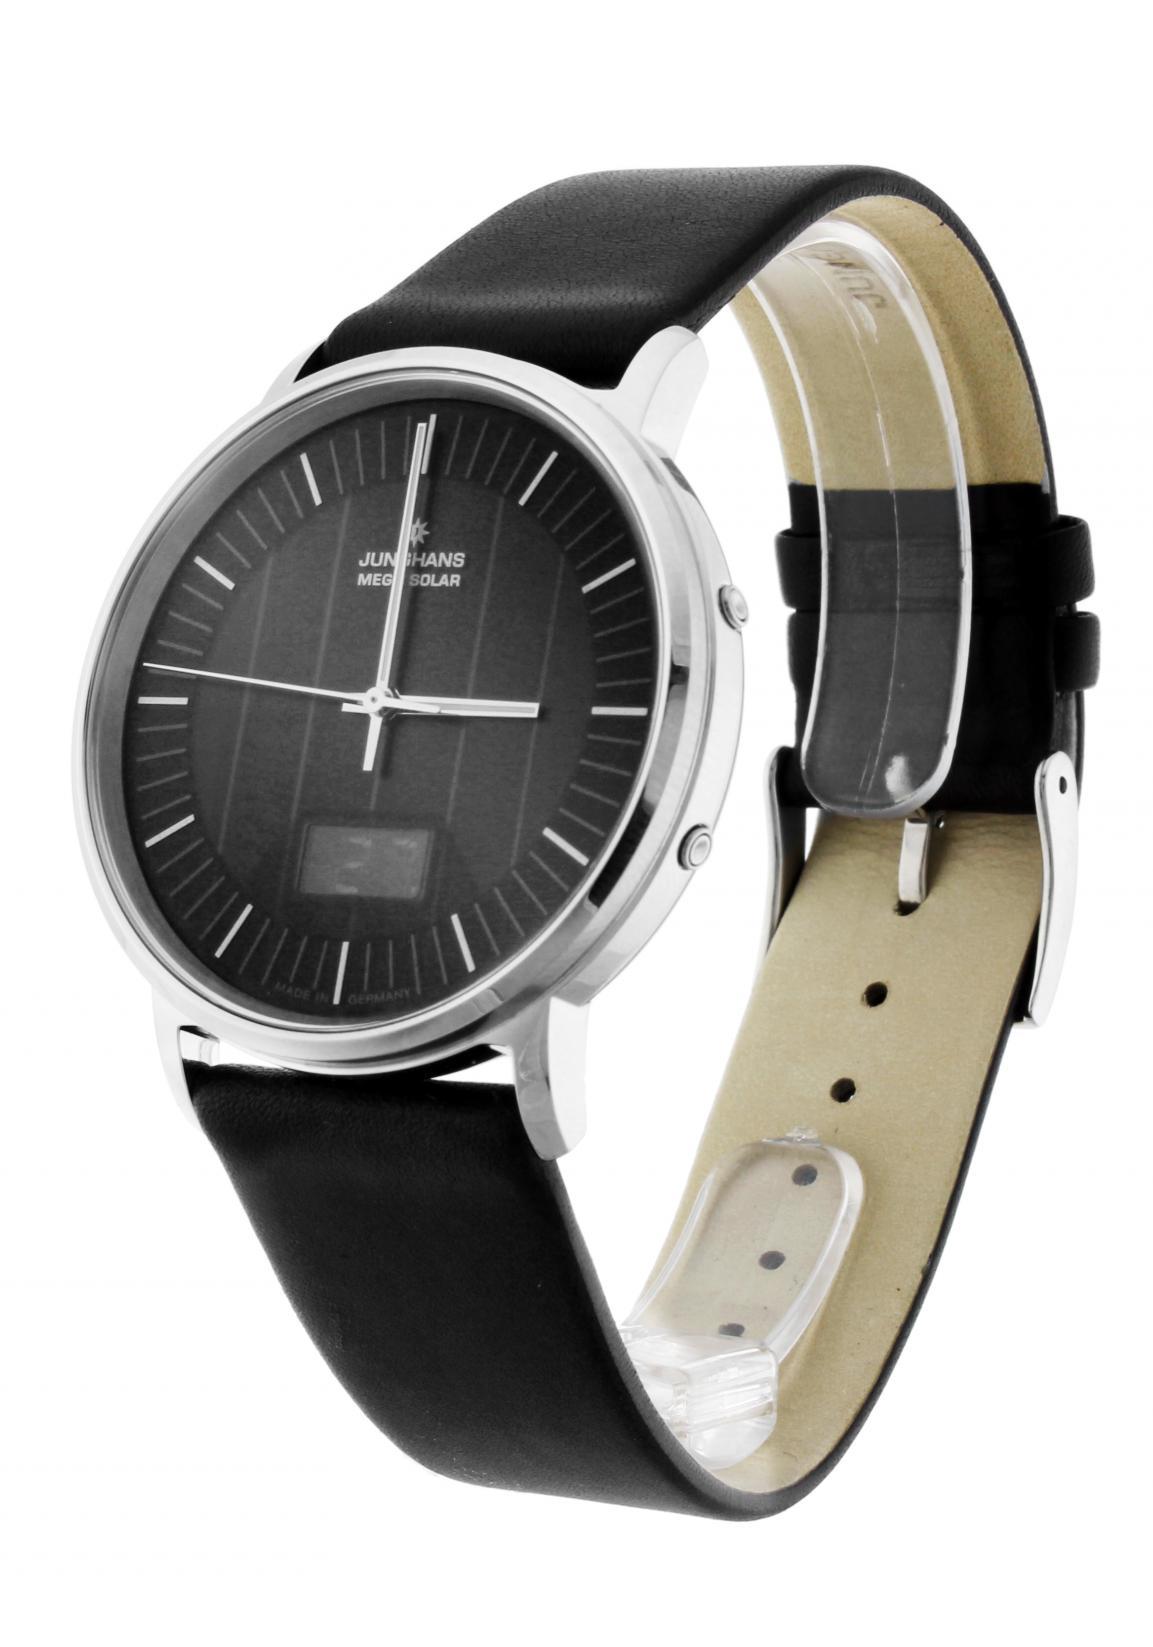 junghans milano mega solar radio controlled watch nur 539 00